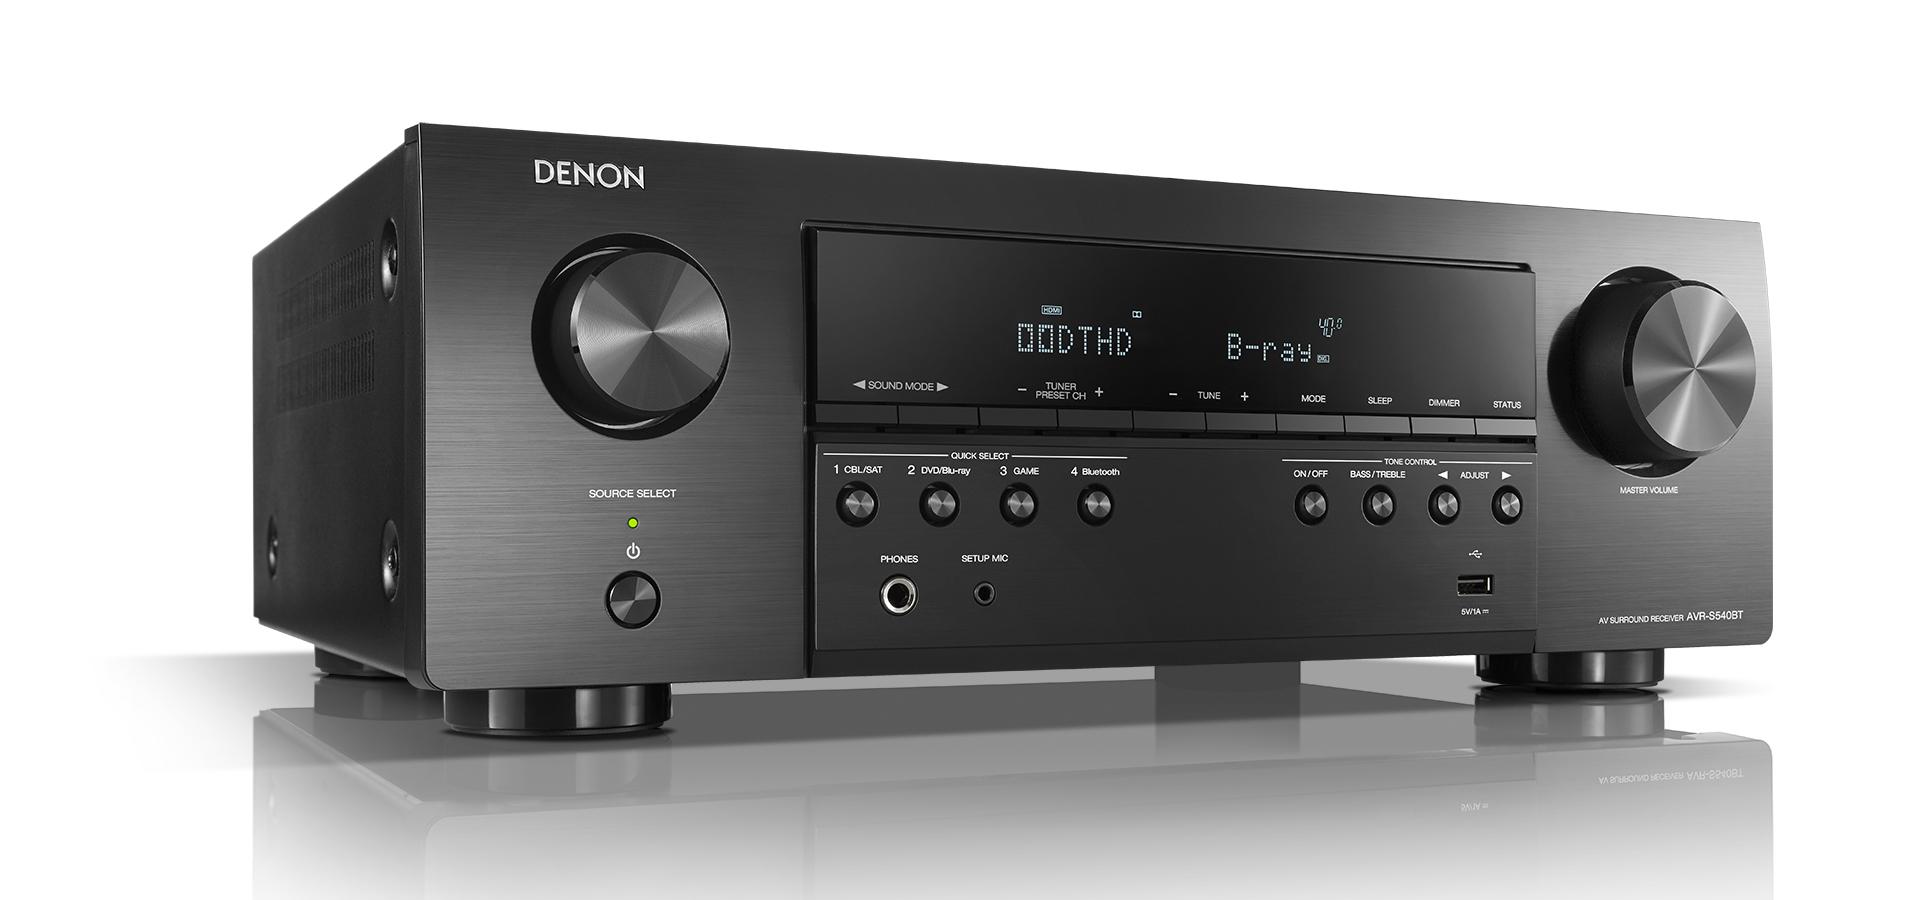 YMMV - $150 for Denon AVR-S540BT